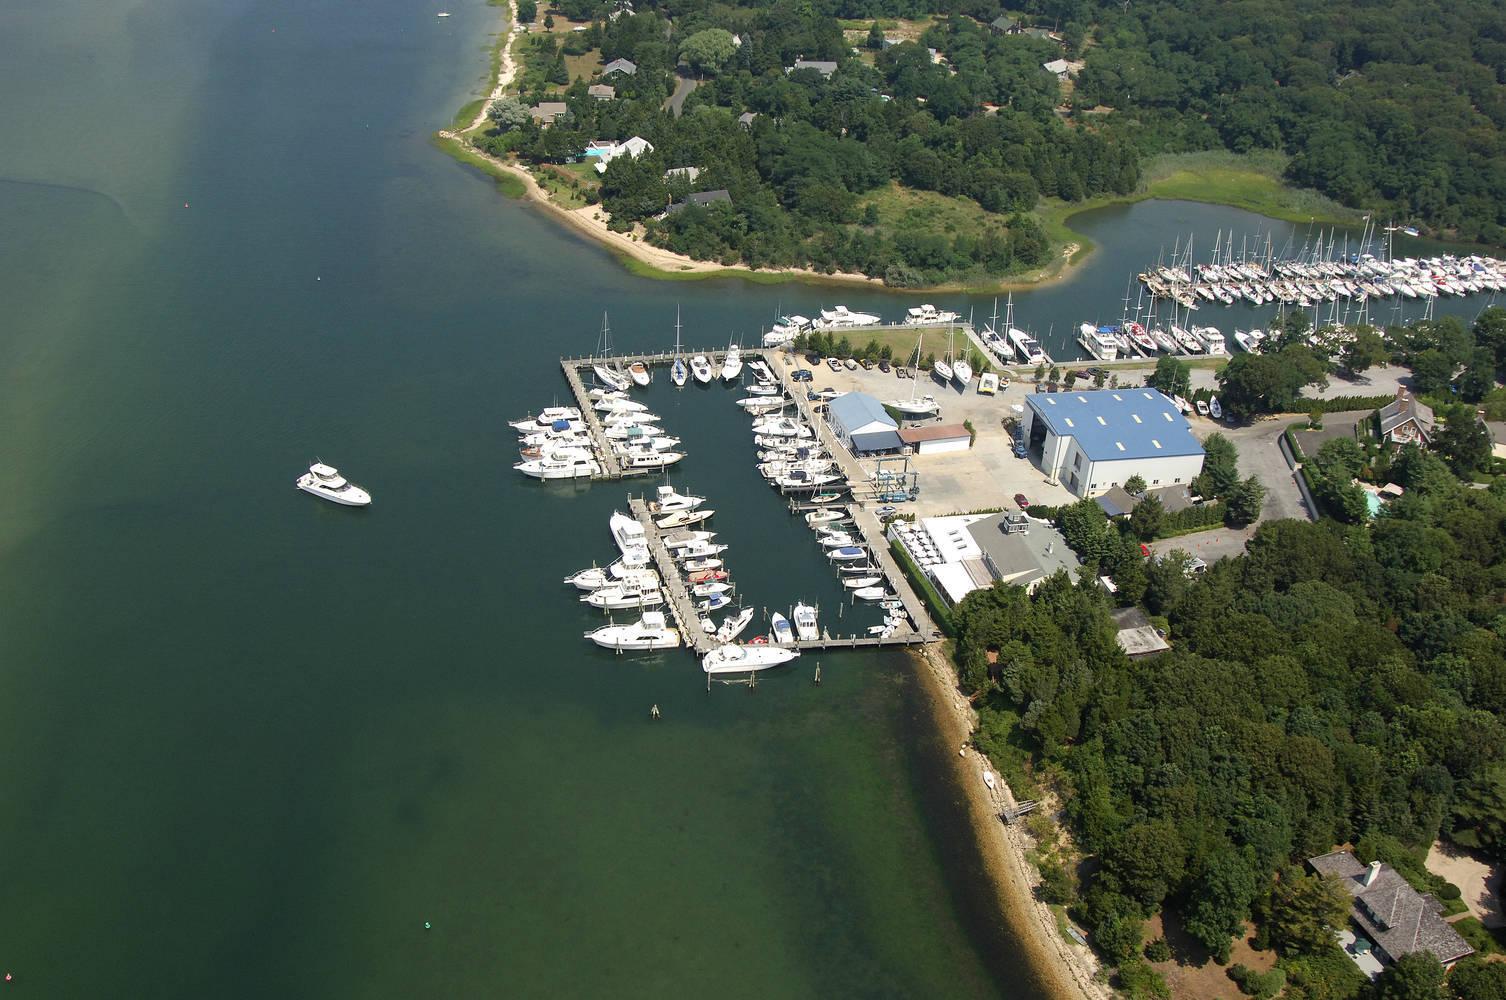 East Hampton Point Marina Slip Dock Mooring Reservations